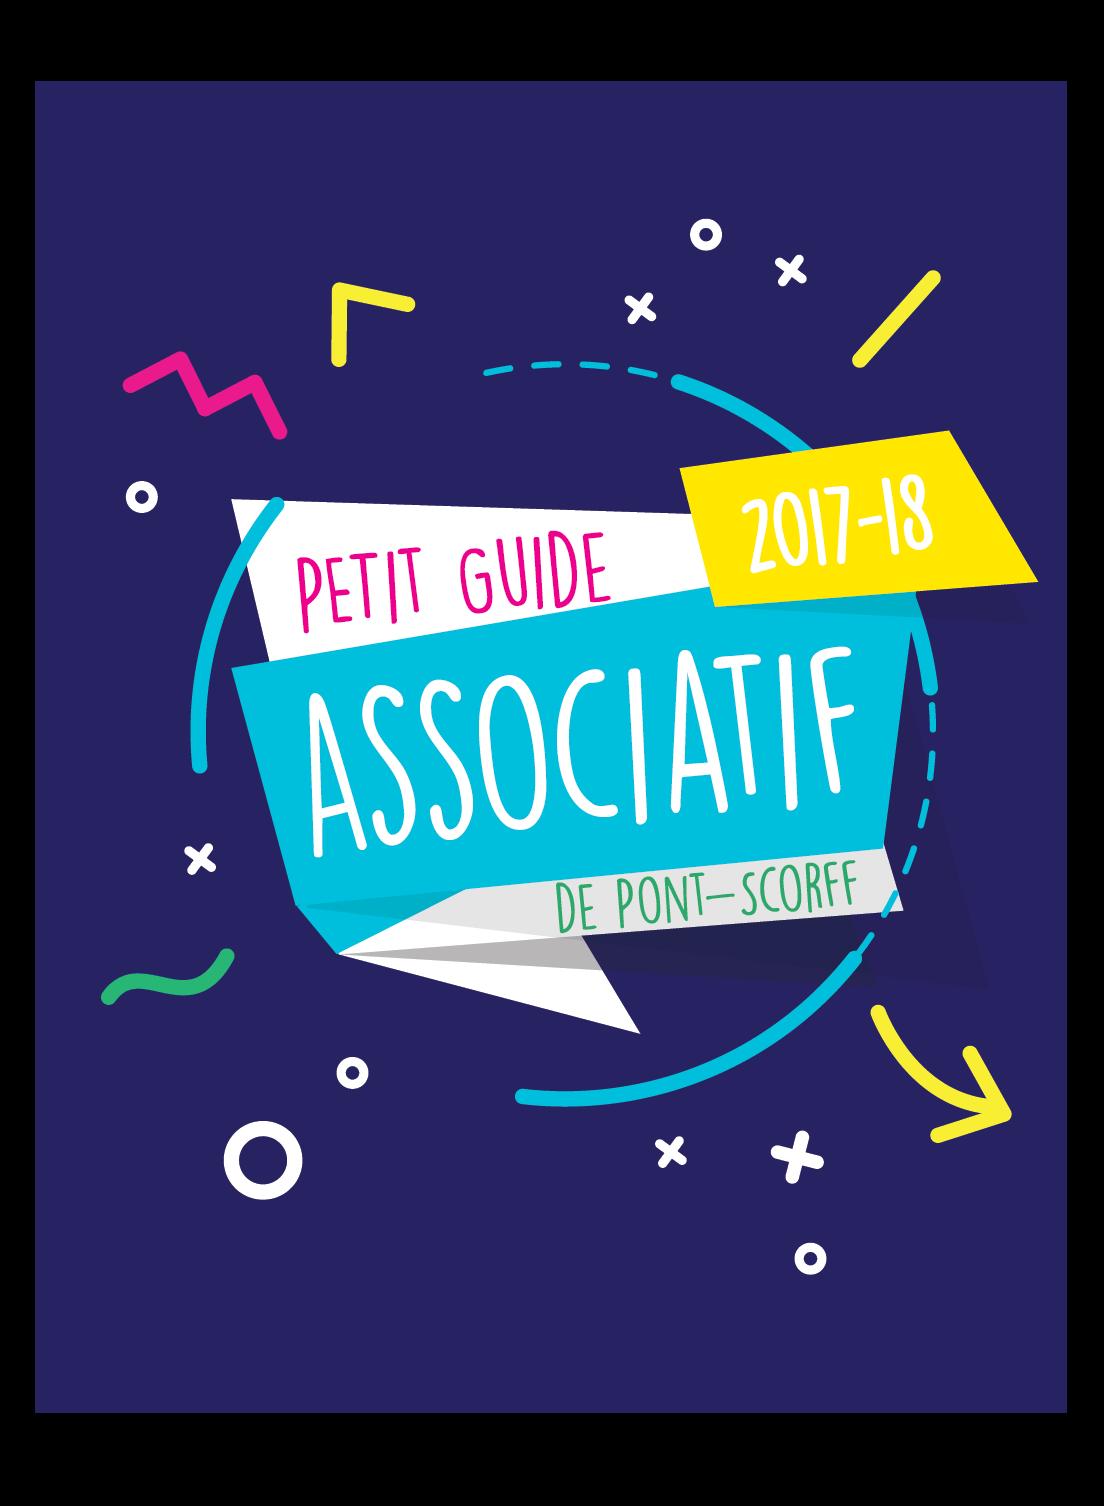 Petit guide associatif